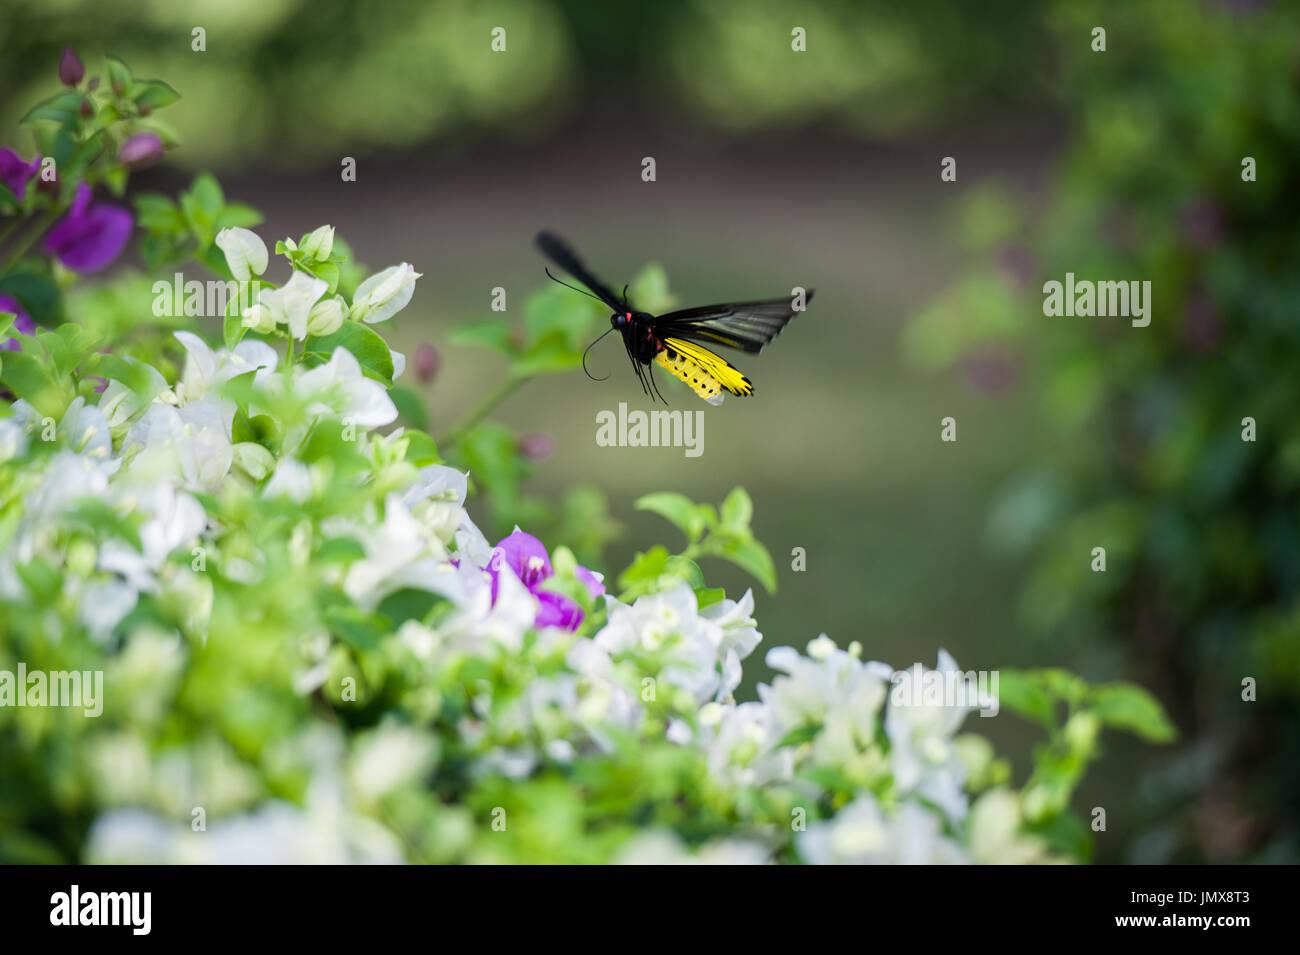 Farfalla in wildlife presi in Thailandia Immagini Stock